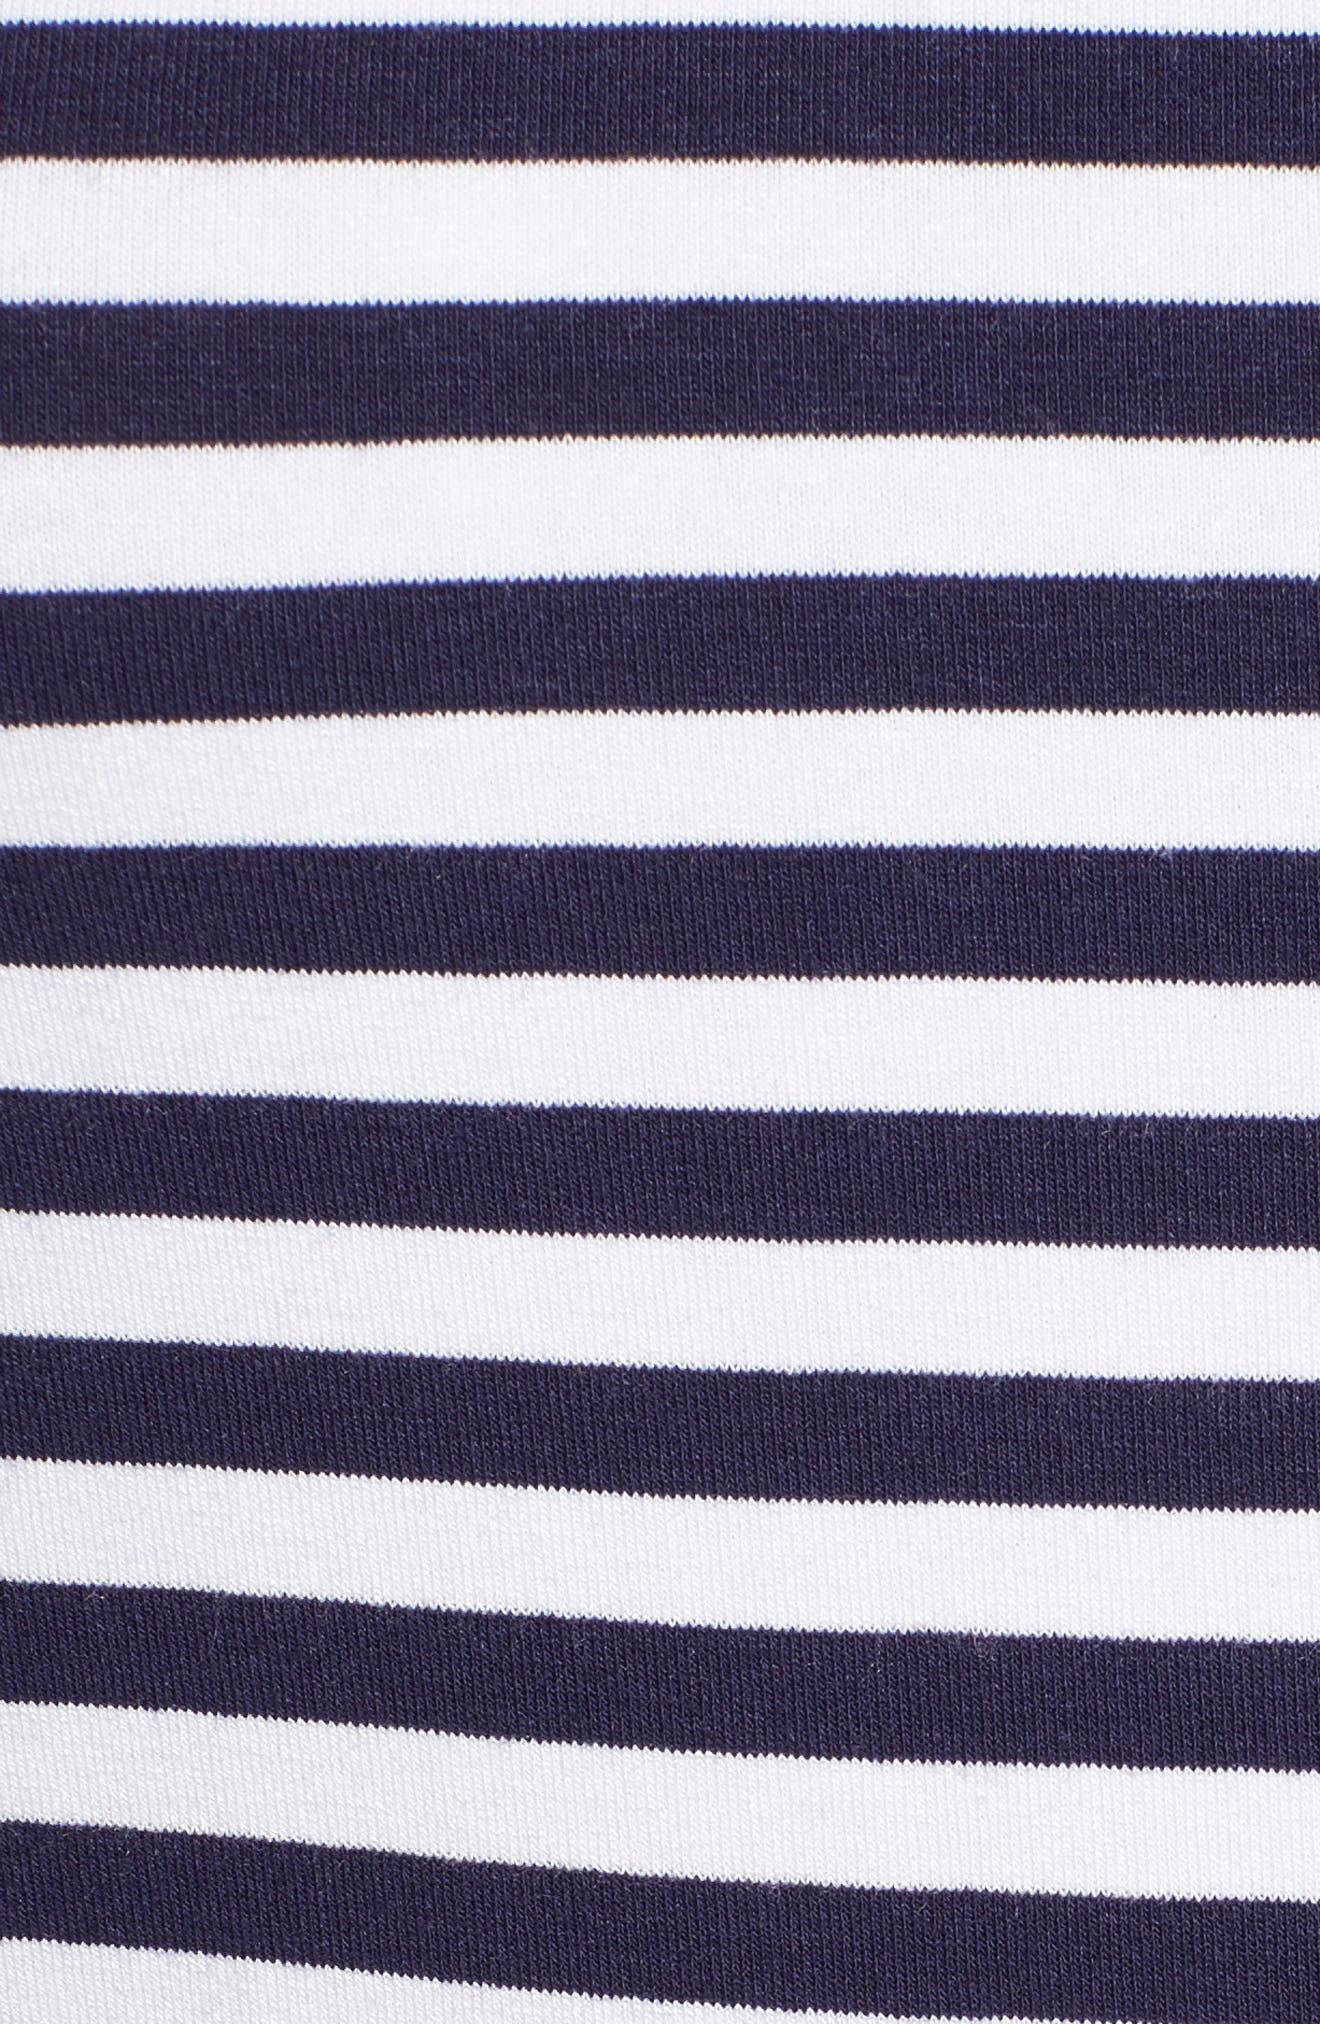 Stripe Long Sleeve Tee,                             Alternate thumbnail 5, color,                             410